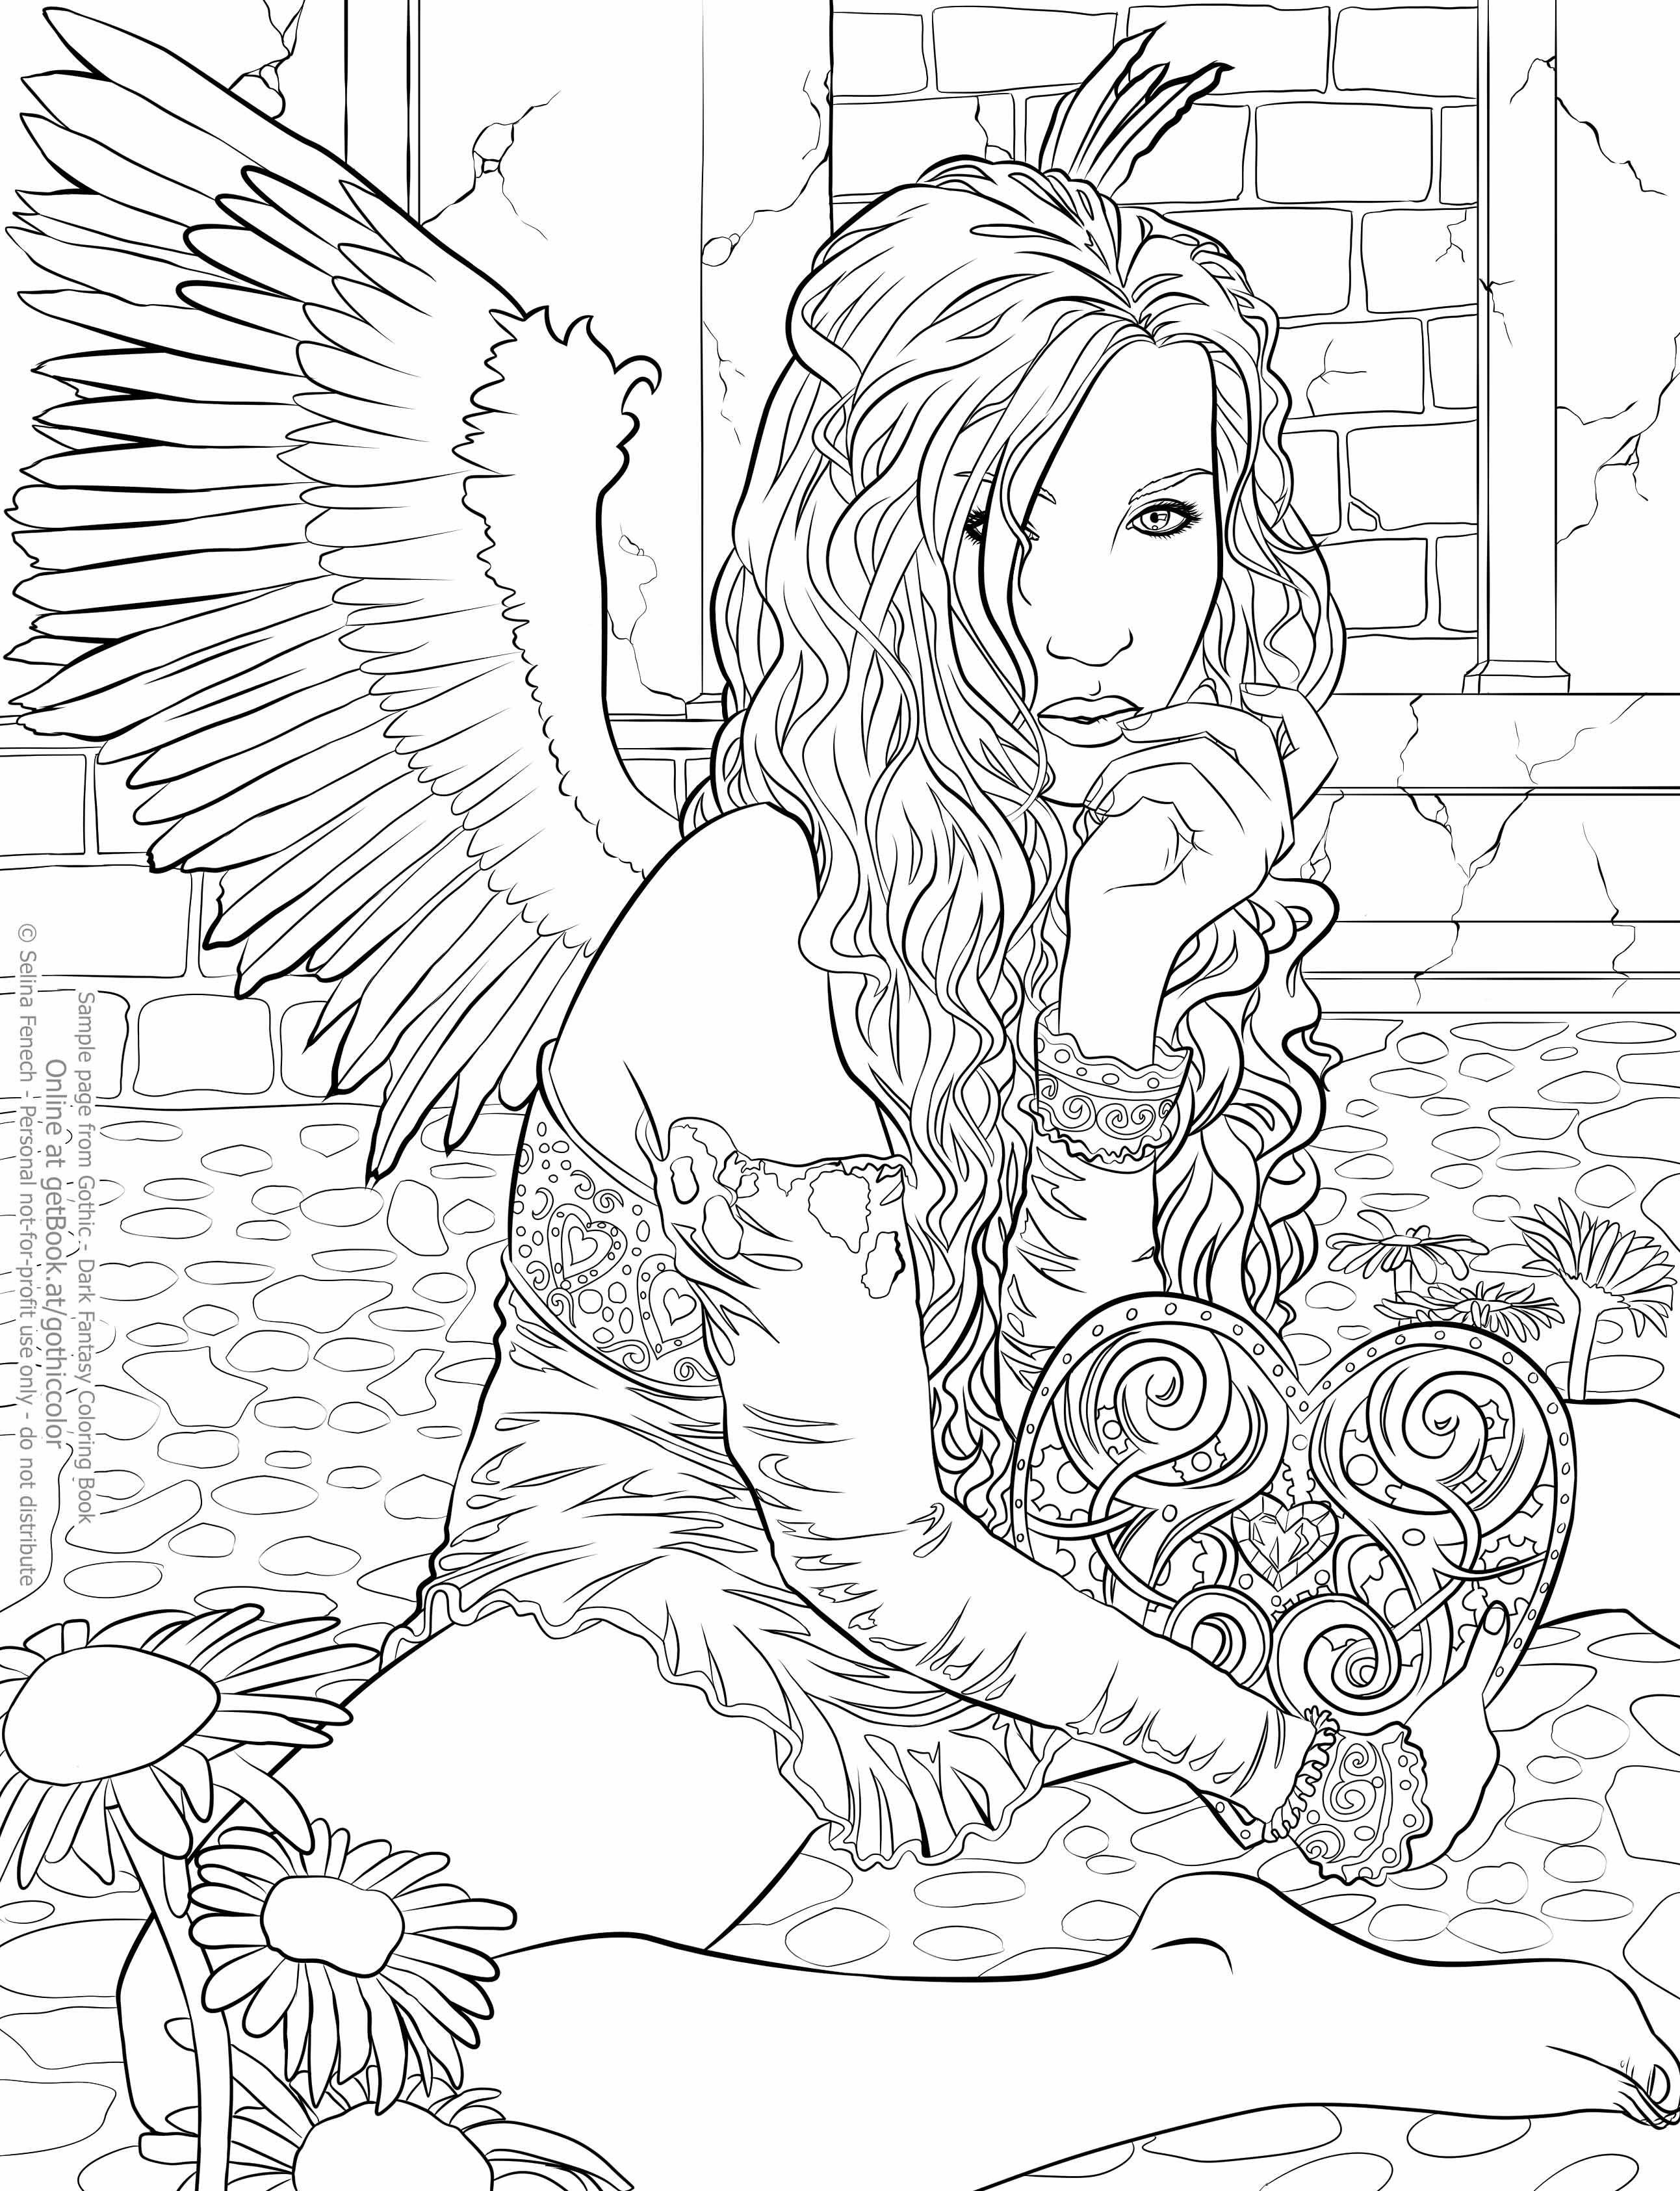 Selinafenech Gothiccoloringbook Clockworkheart Kleurboek Kleurplaten Engel Tekening